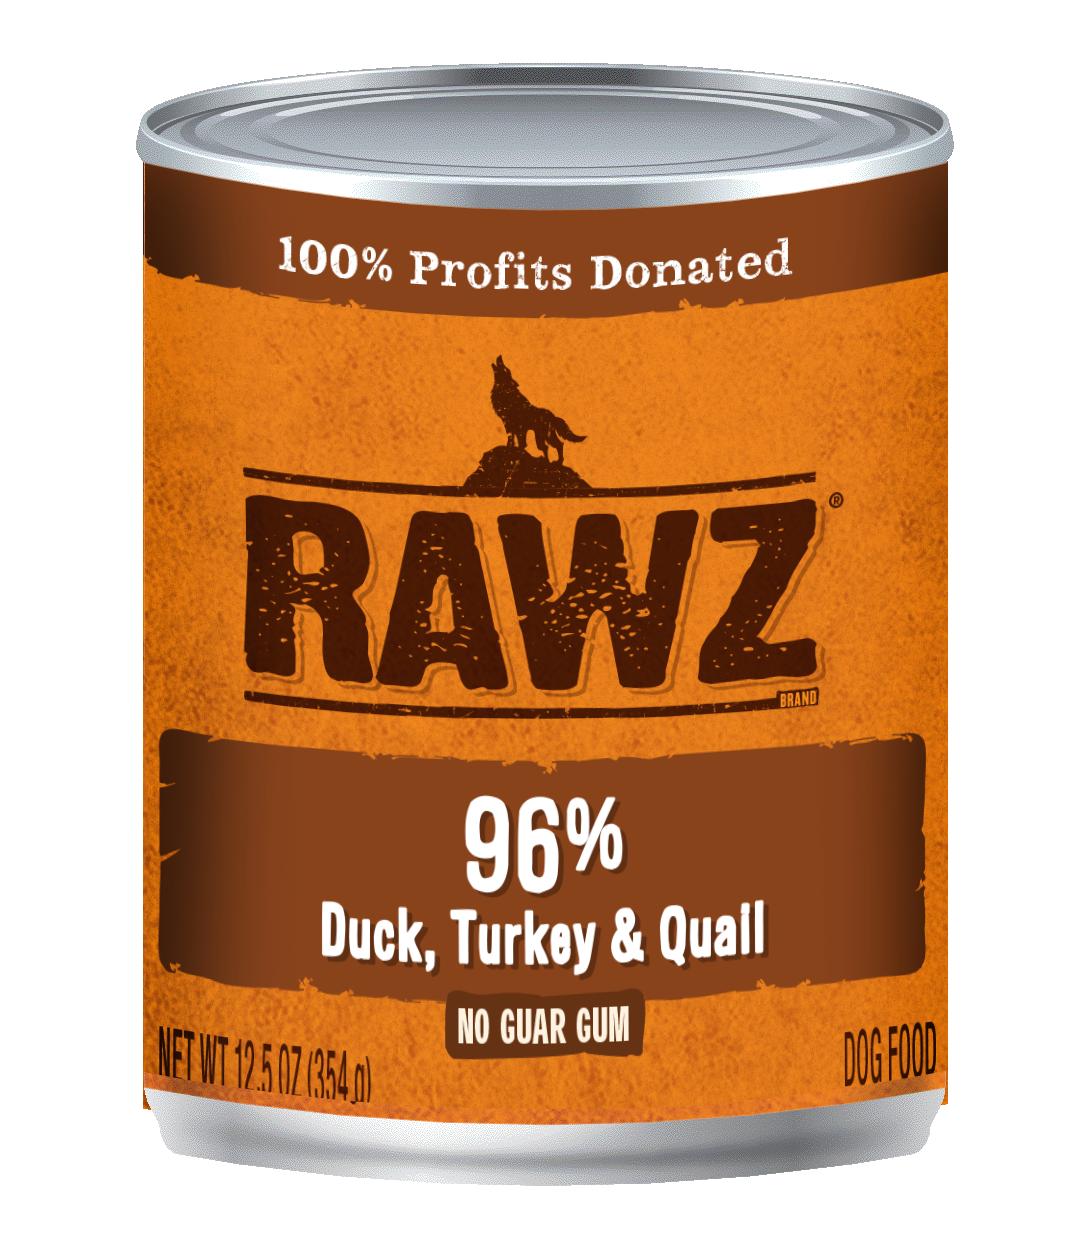 RAWZ Dog 96% Duck, Turkey & Quail, 12.5-oz